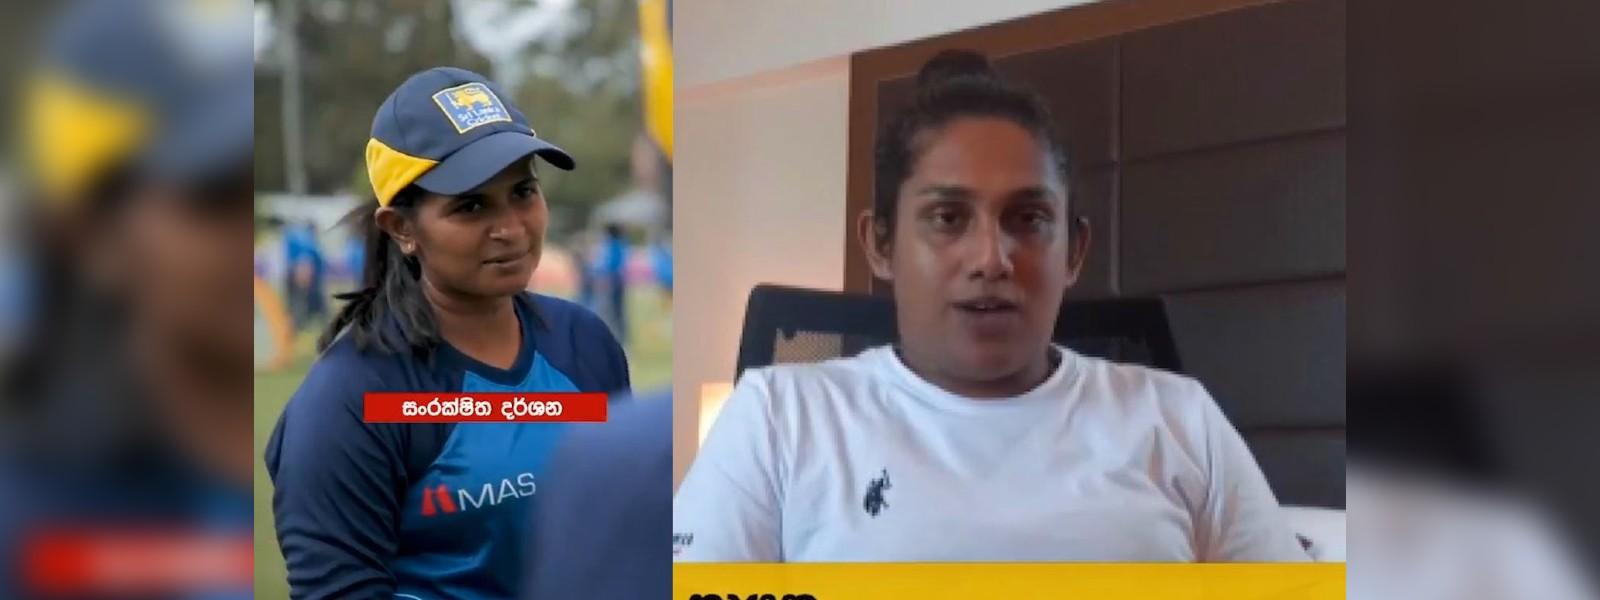 Women's T20 Challenge තරගාවලියට චමරි අතපත්තු සහ ශෂිකලා සිරිවර්ධන එක්වෙයි